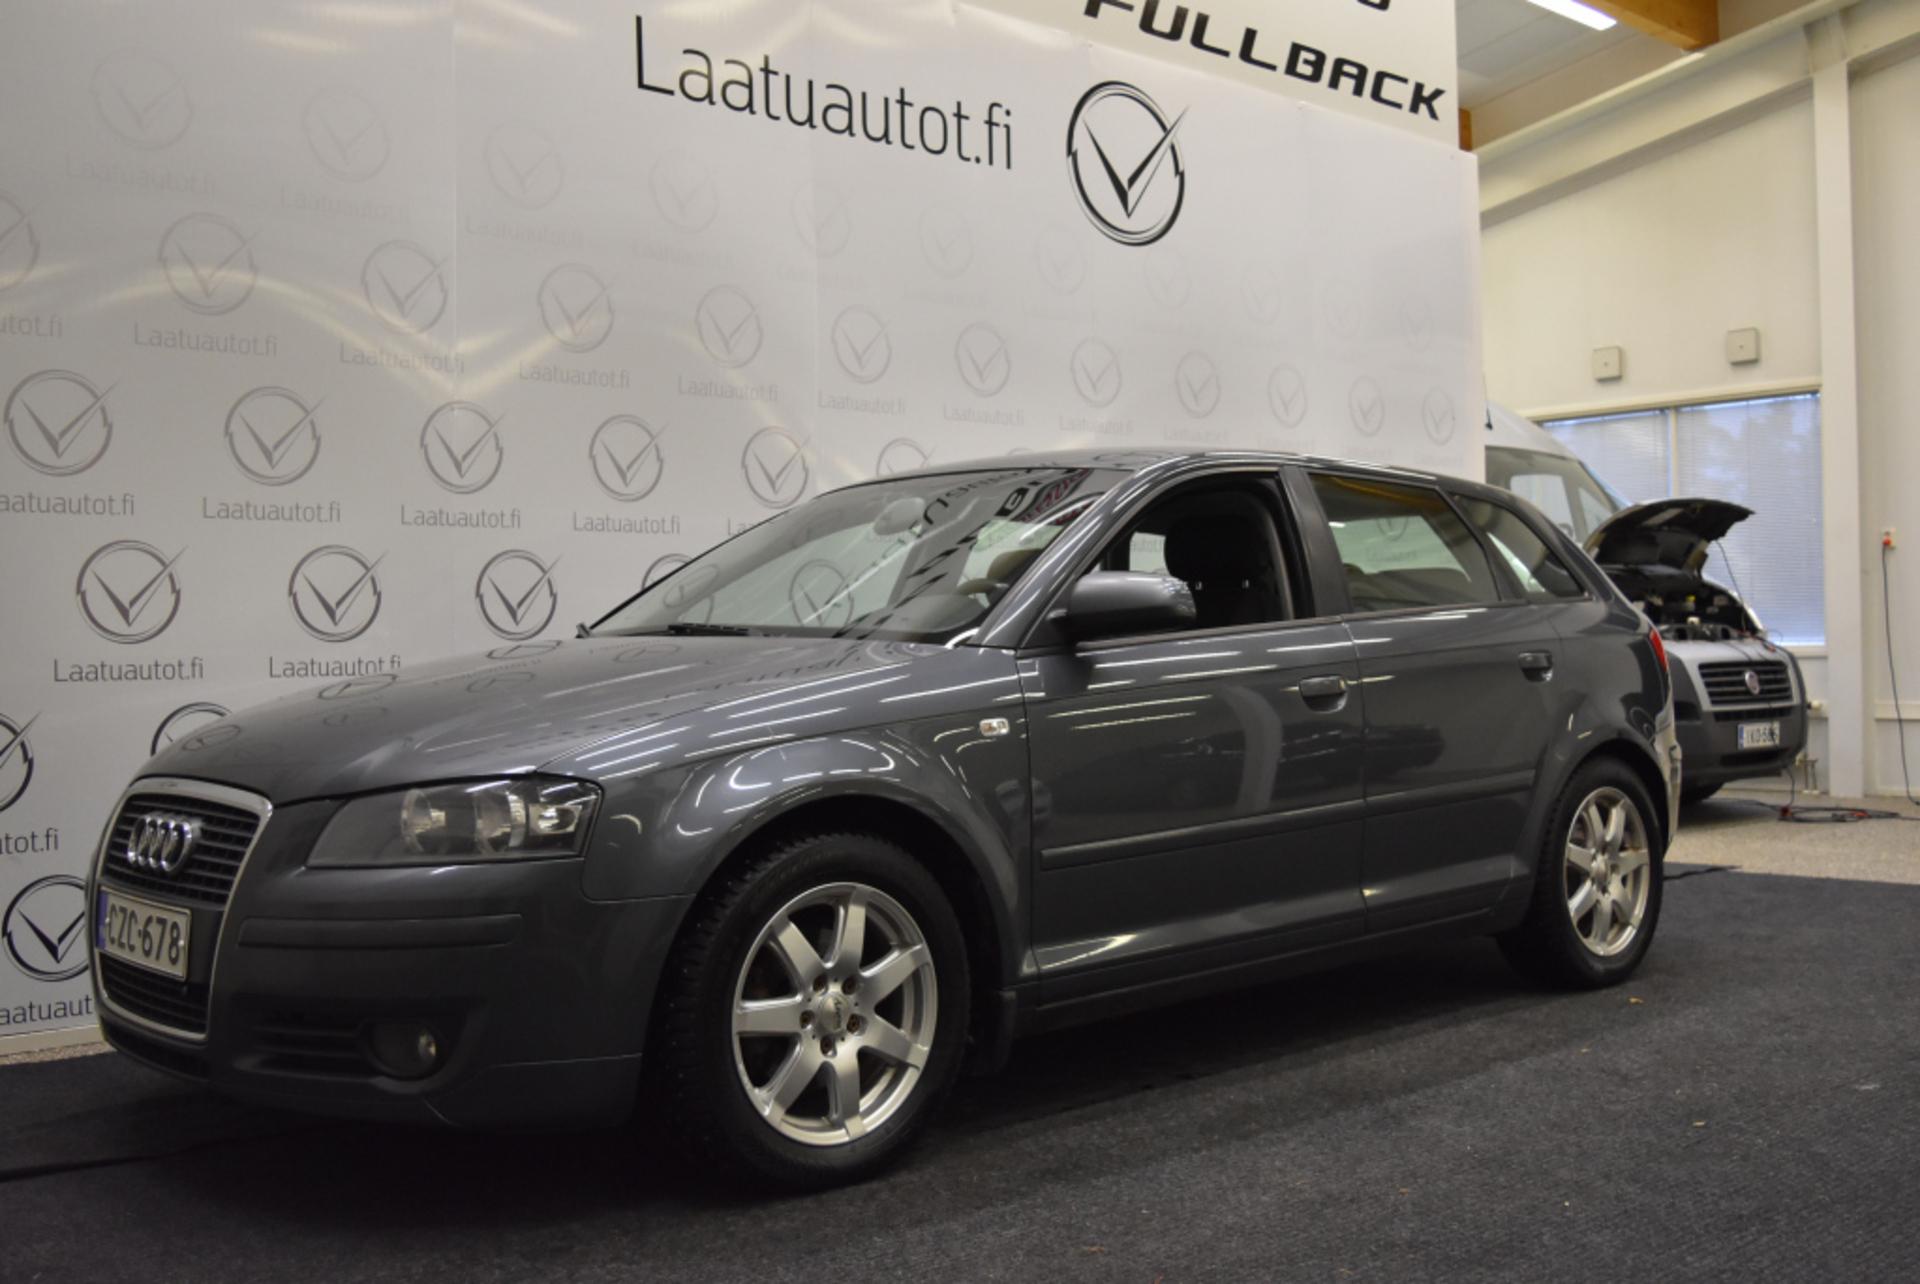 AUDI A3 Sportback Ambiente 1, 6 75 kW - korkotarjous 1.99%! Auto Ac,  Vakionopeudensääd,  Koukku!